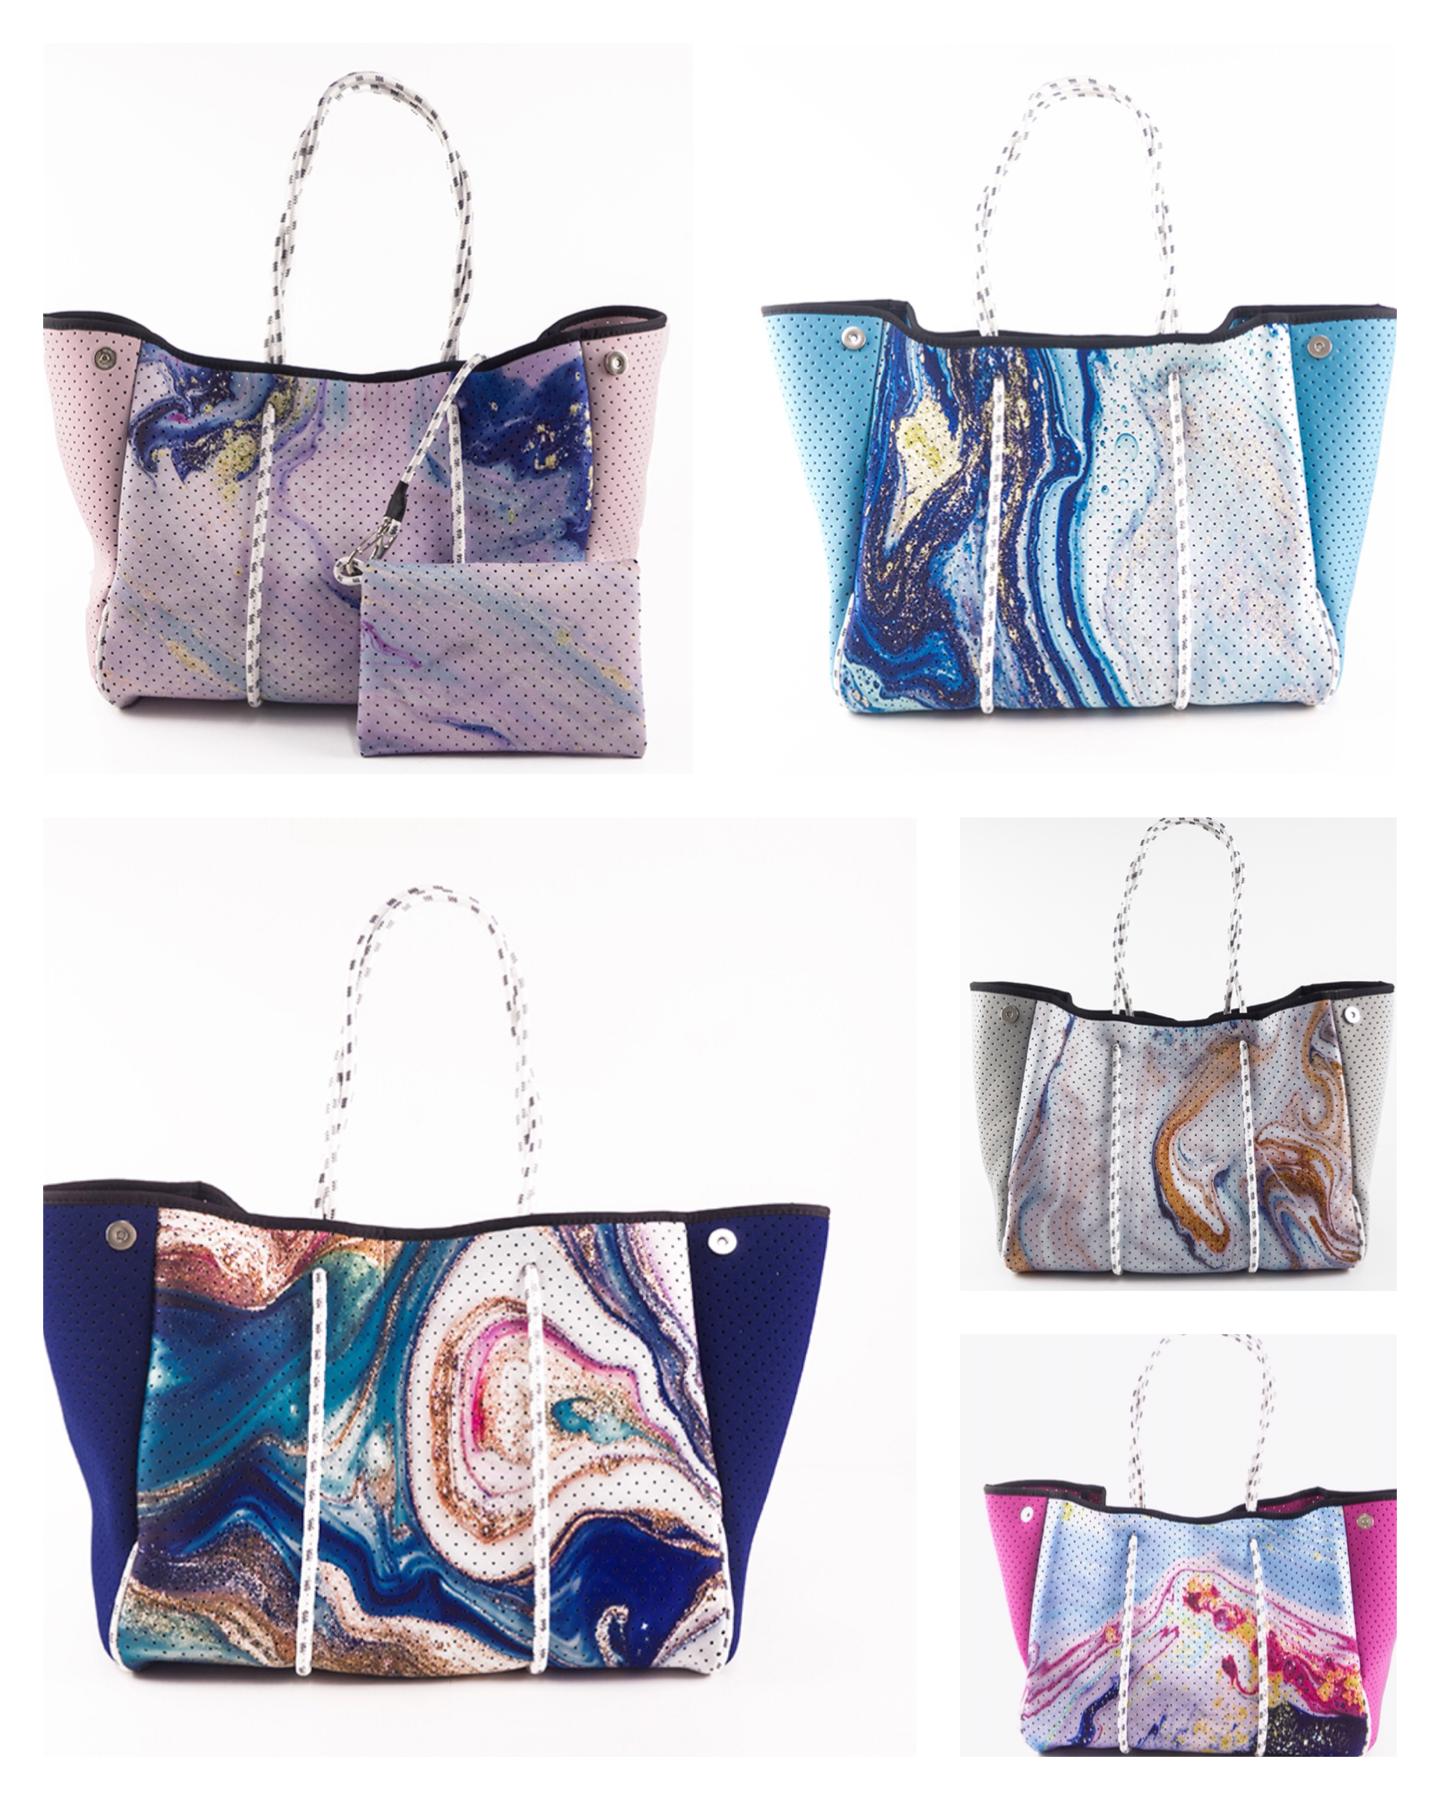 Neoprene Tote Bags